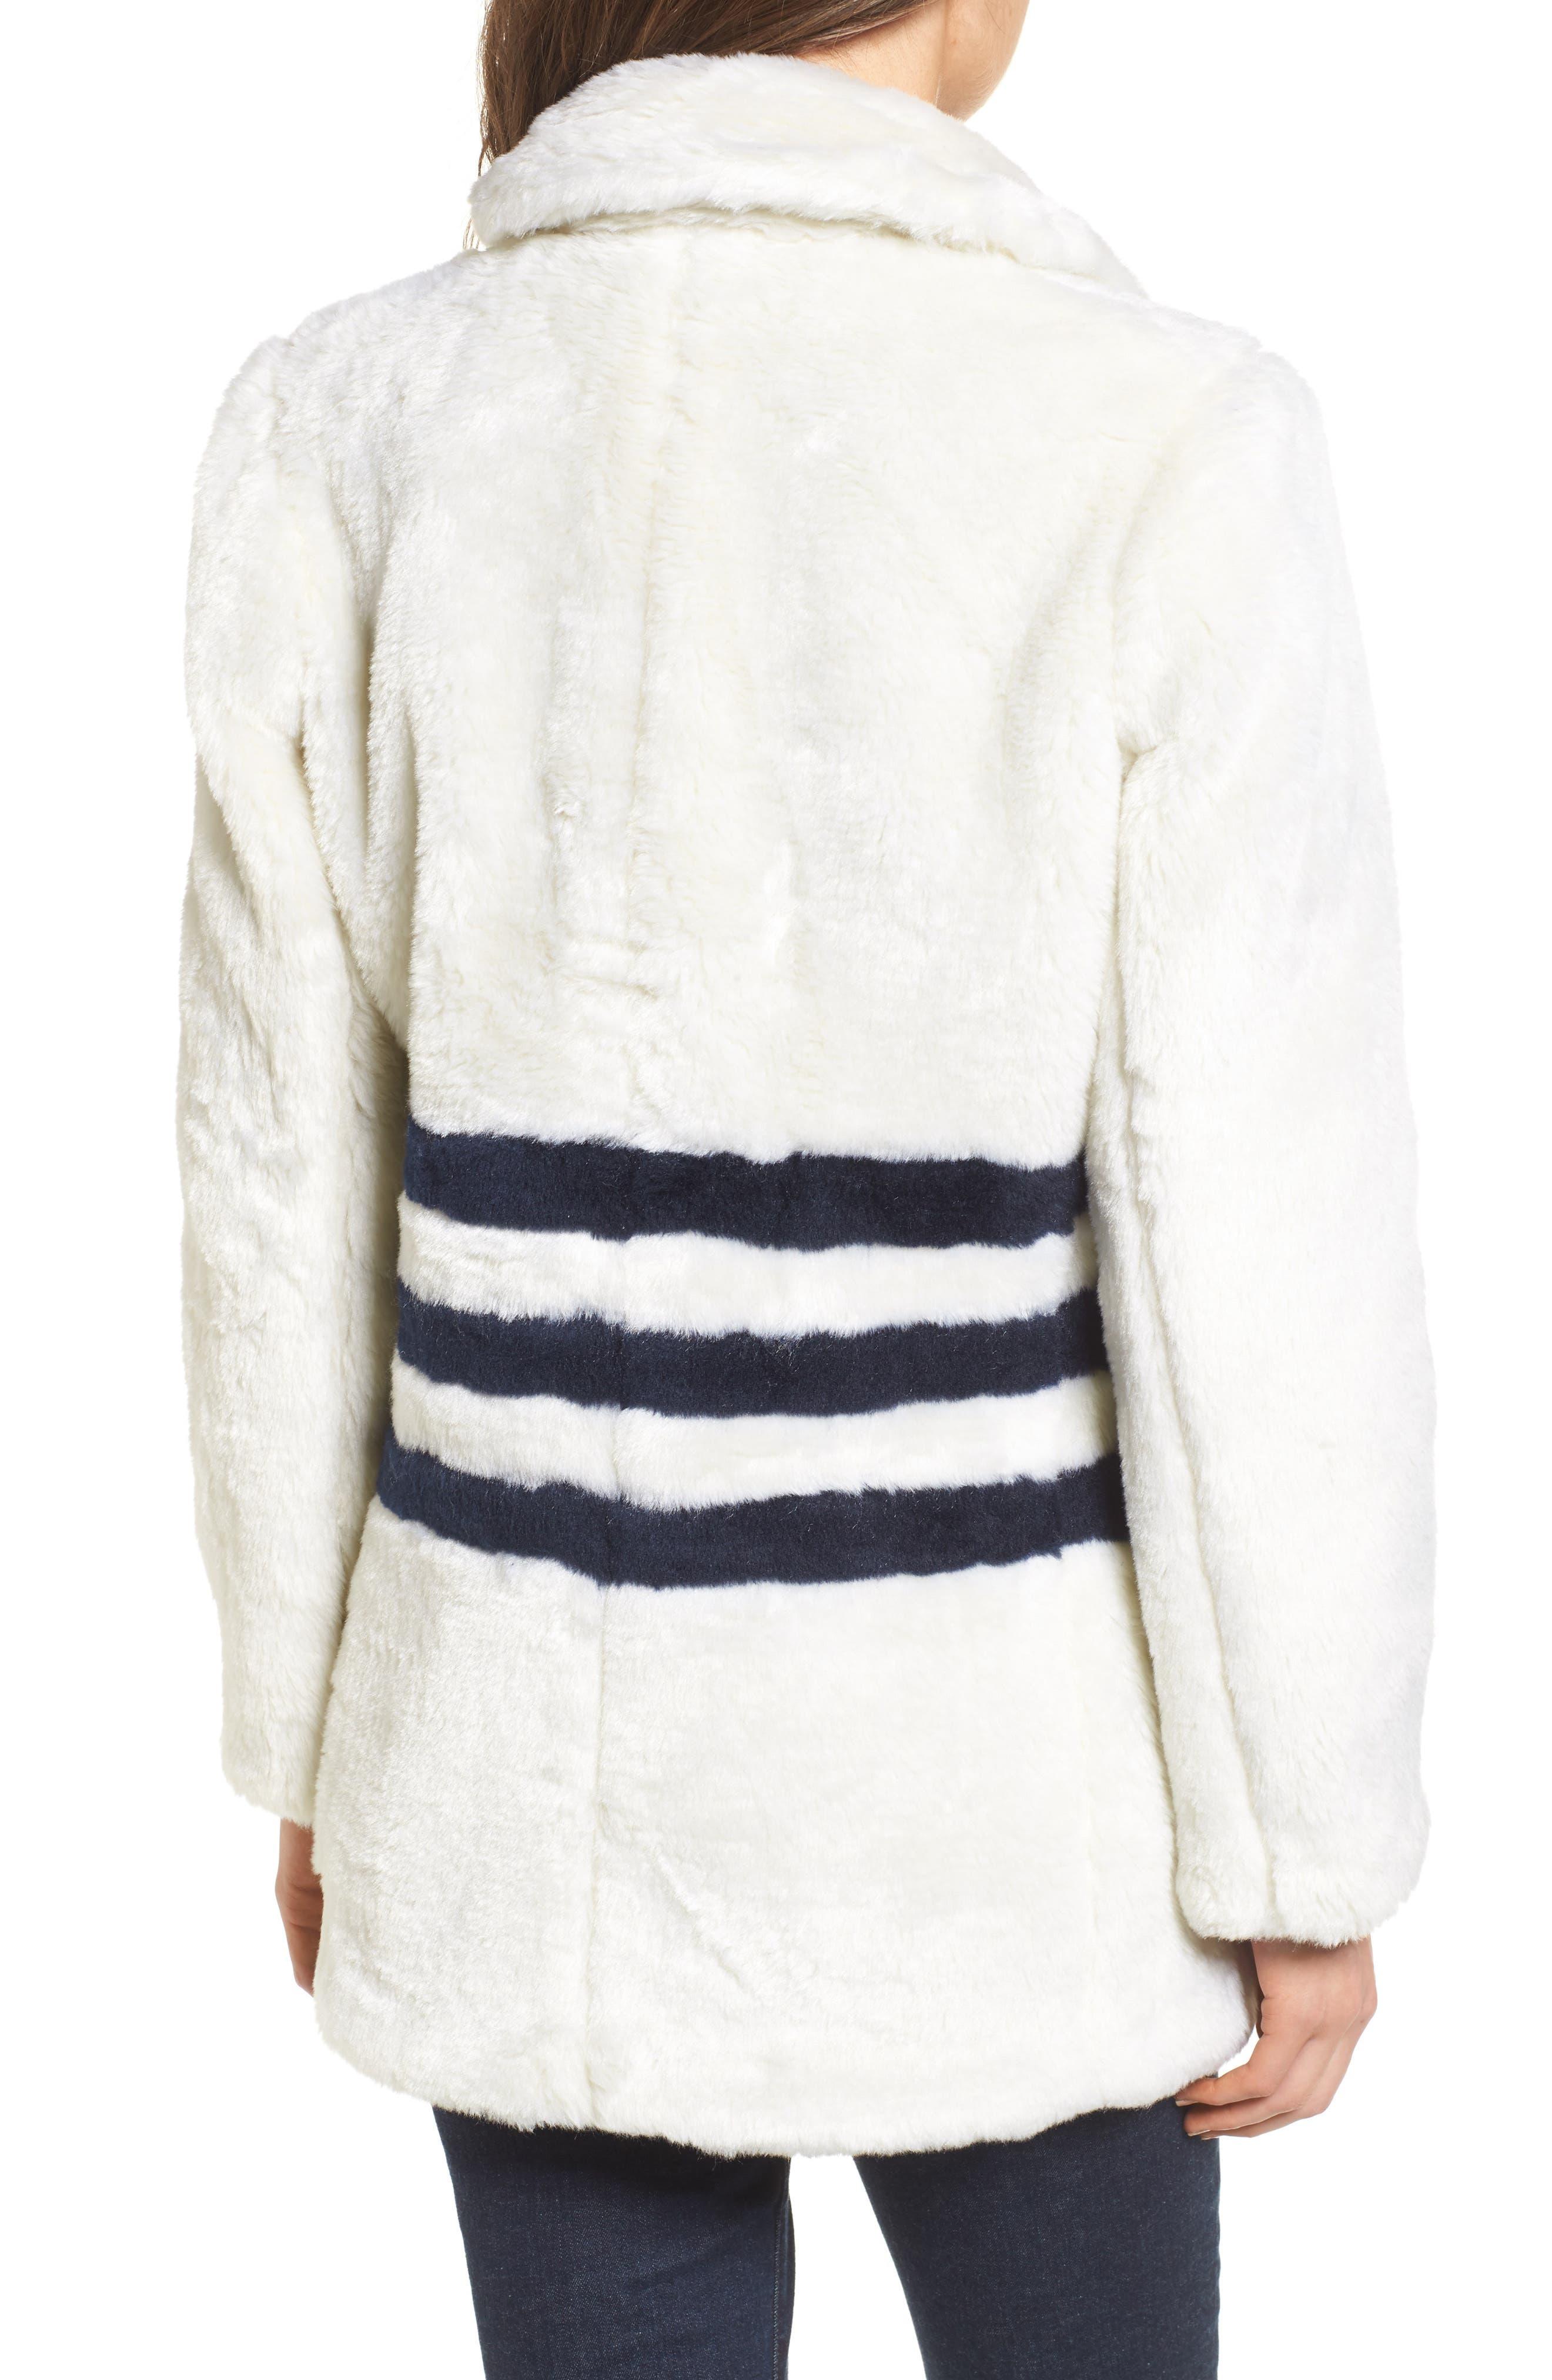 J.Crew Yuna Teddy Faux Fur Jacket,                             Alternate thumbnail 2, color,                             Ivory/ Navy